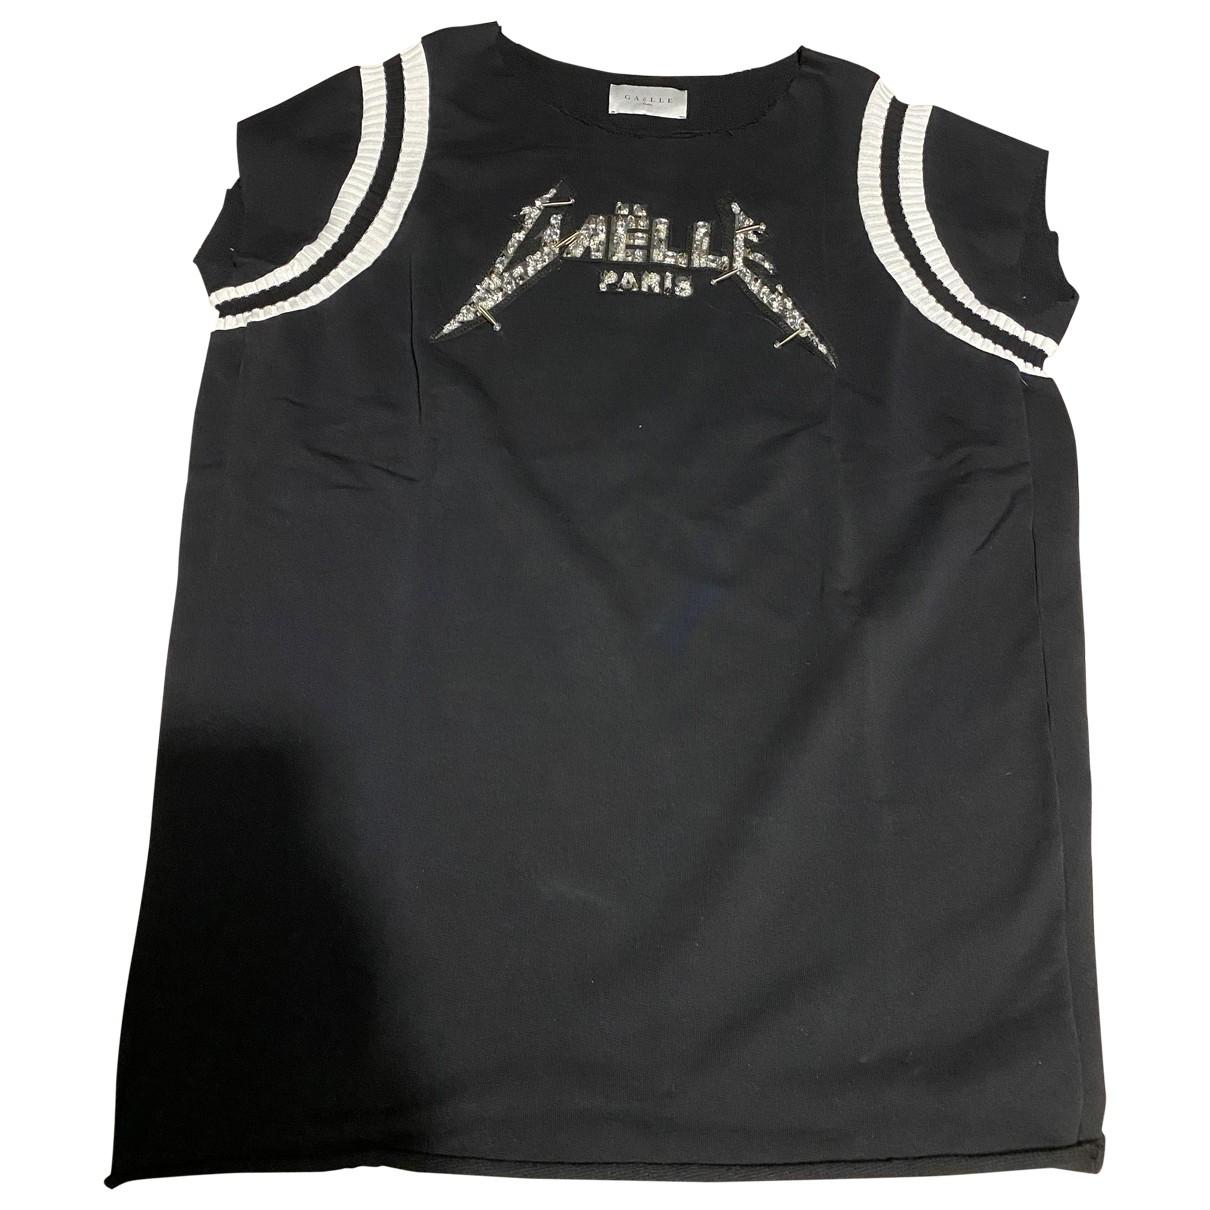 Gaelle Paris \N Black Cotton Knitwear for Women 2 0-5